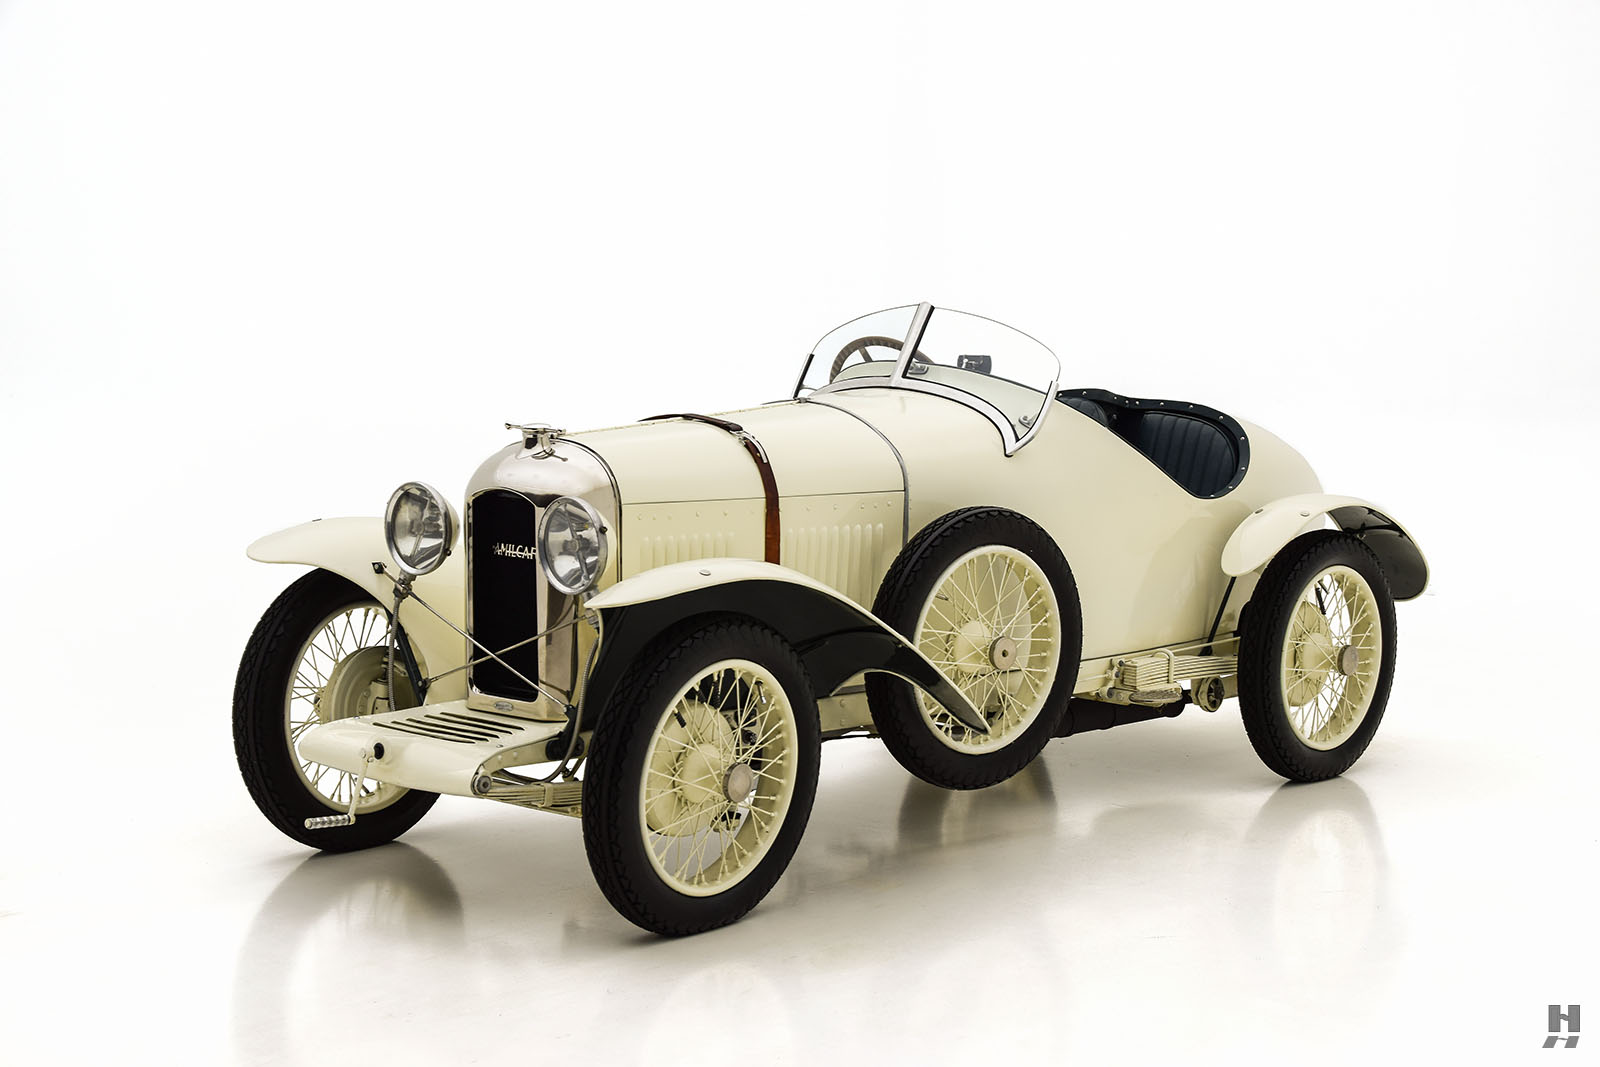 1928-Amilcar-CGSS-Roadstar